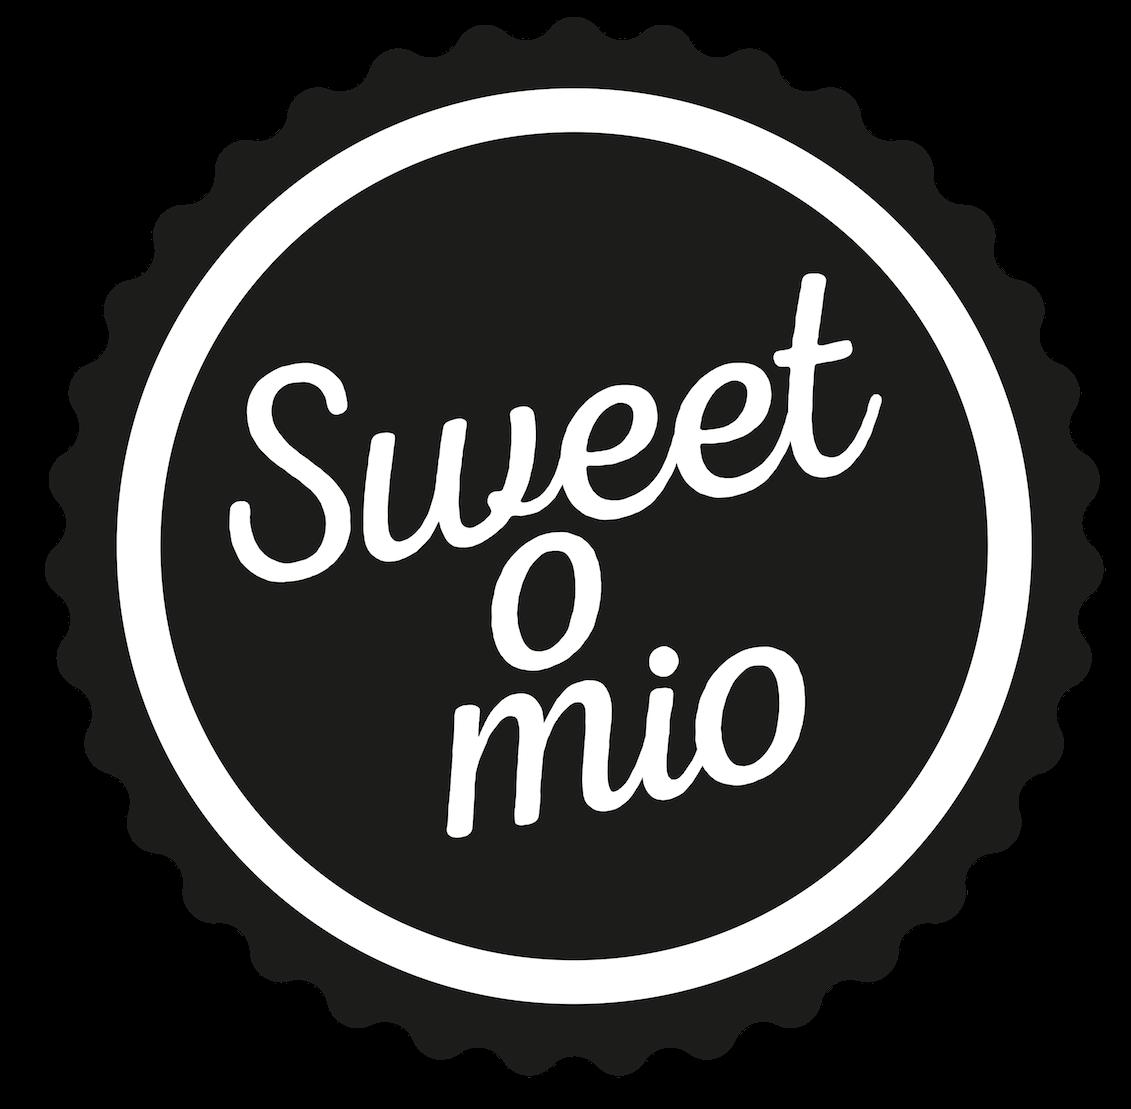 sweetomio.com